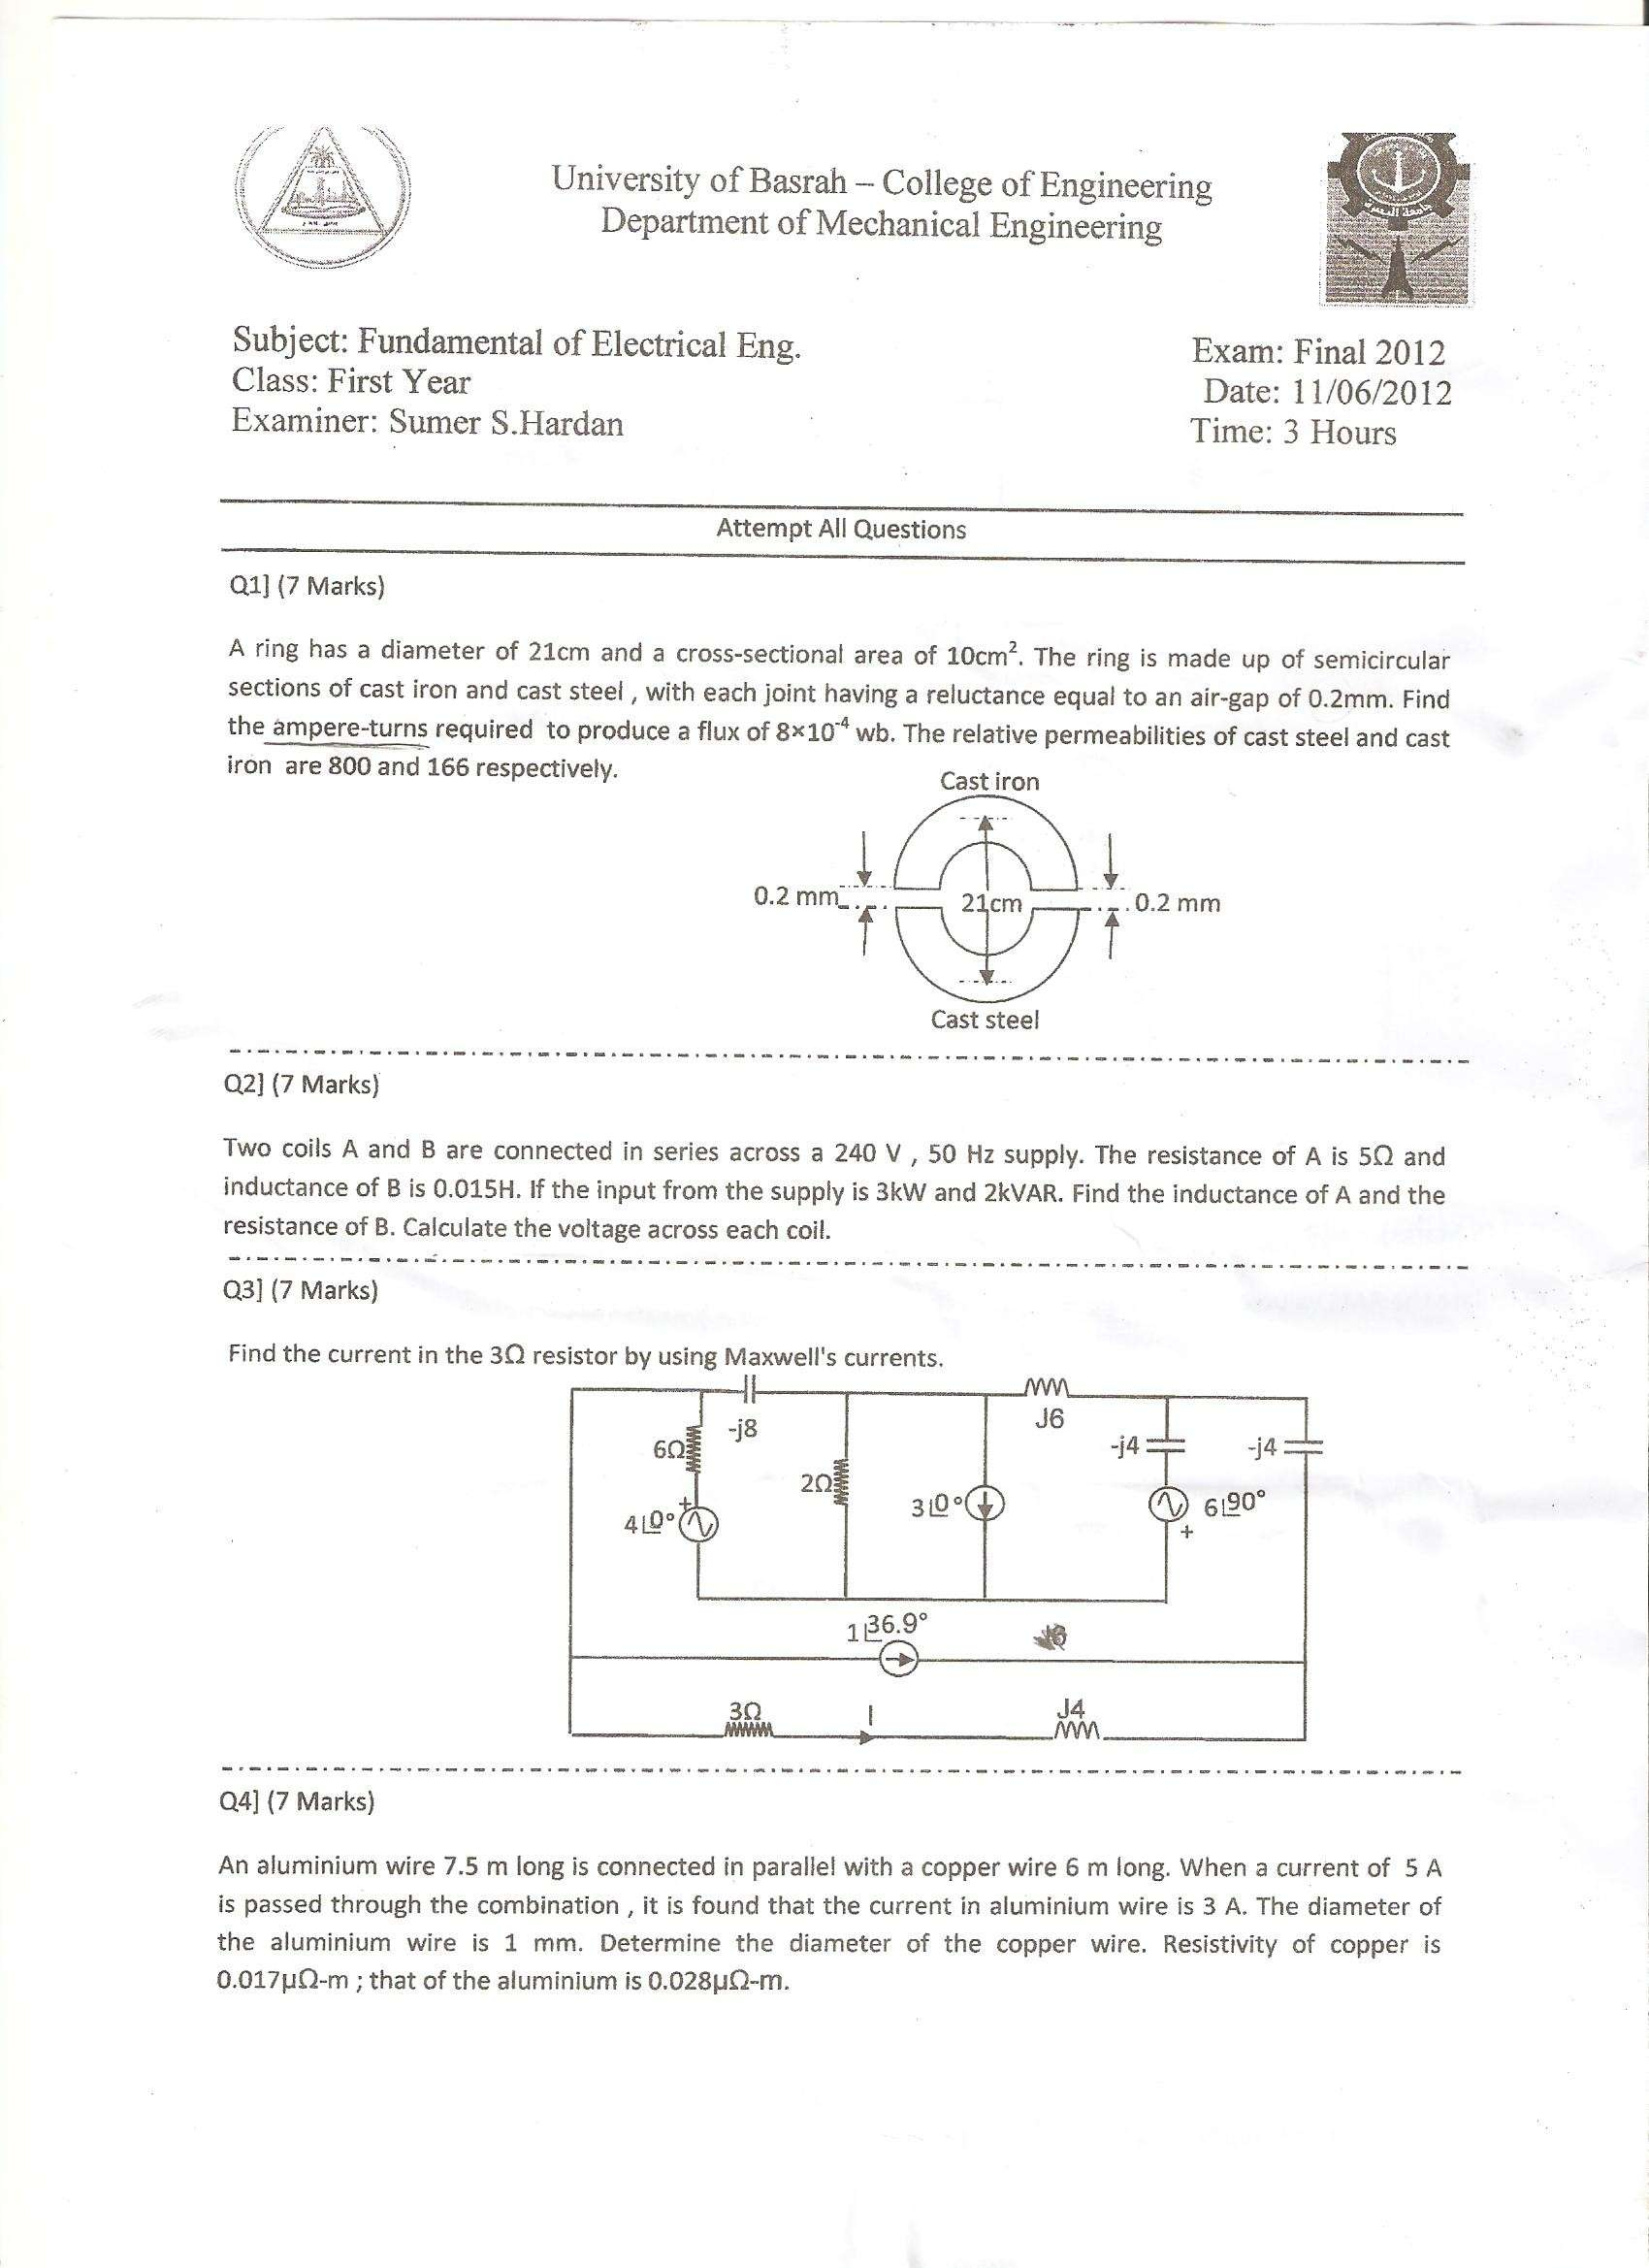 مجموعة اسئلة امتحانات 2012 Uuoooo10